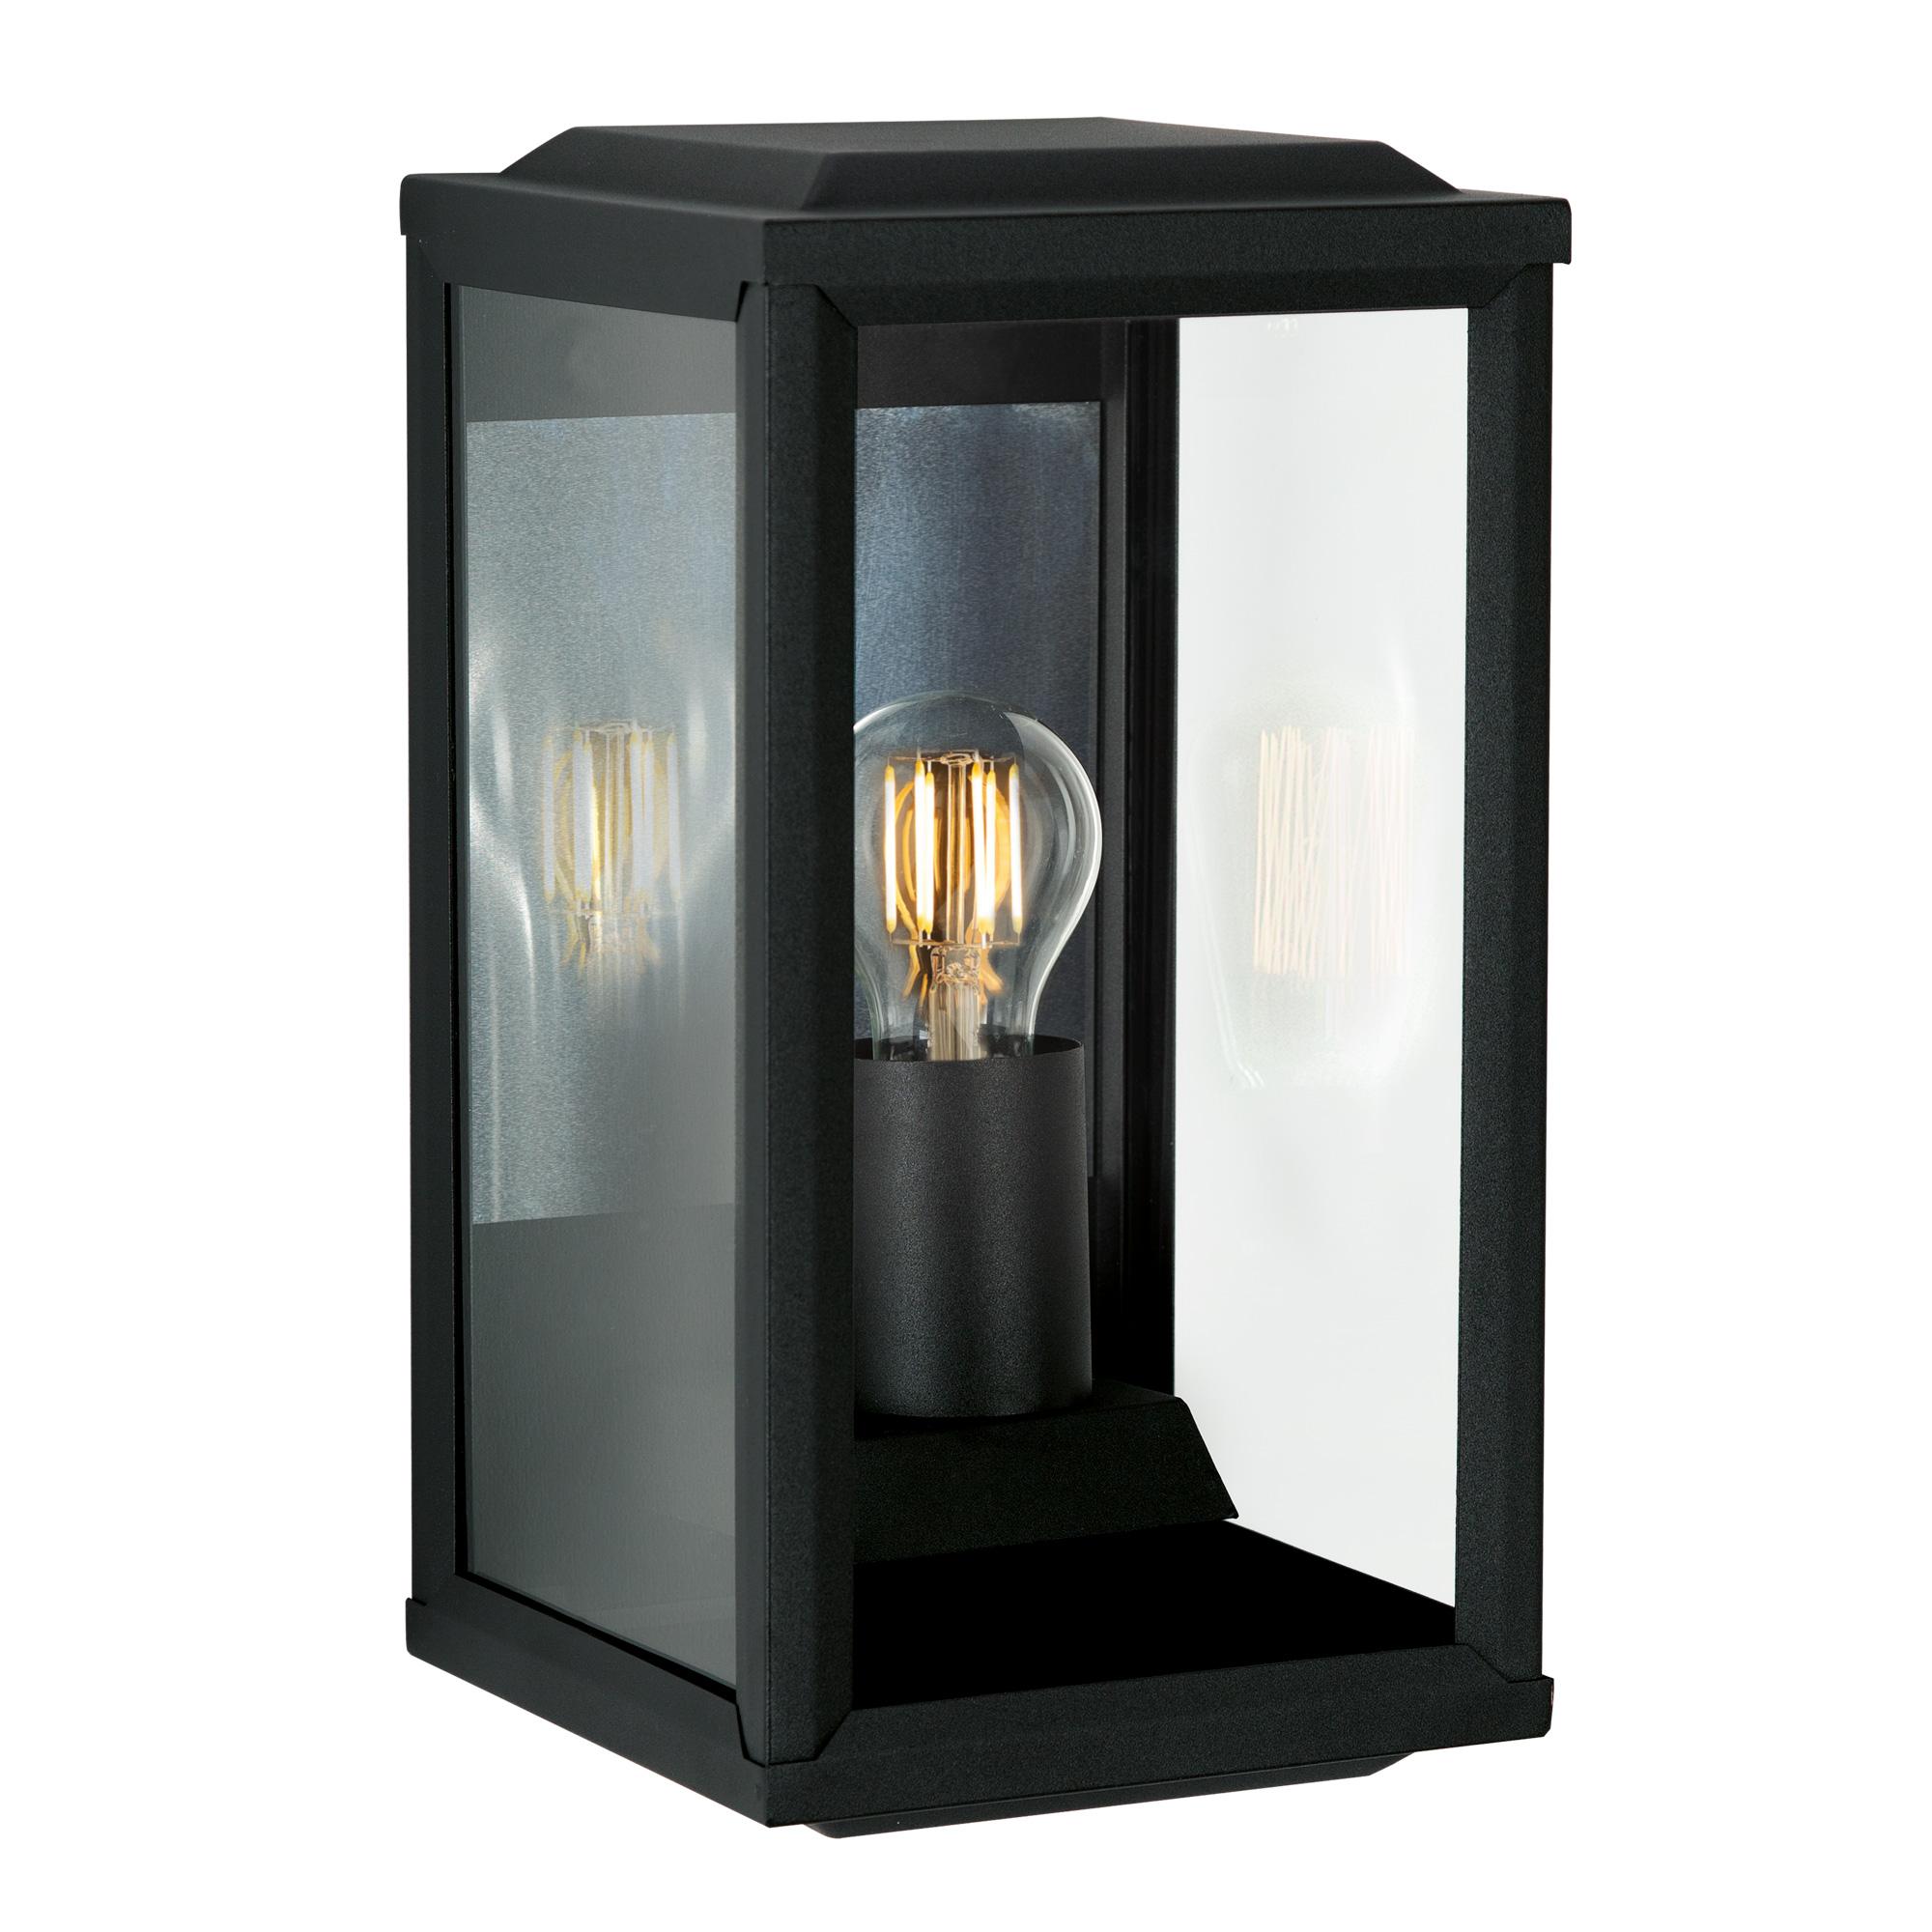 Buitenlamp apos t Gooi Zwart Wandlamp Plat Large